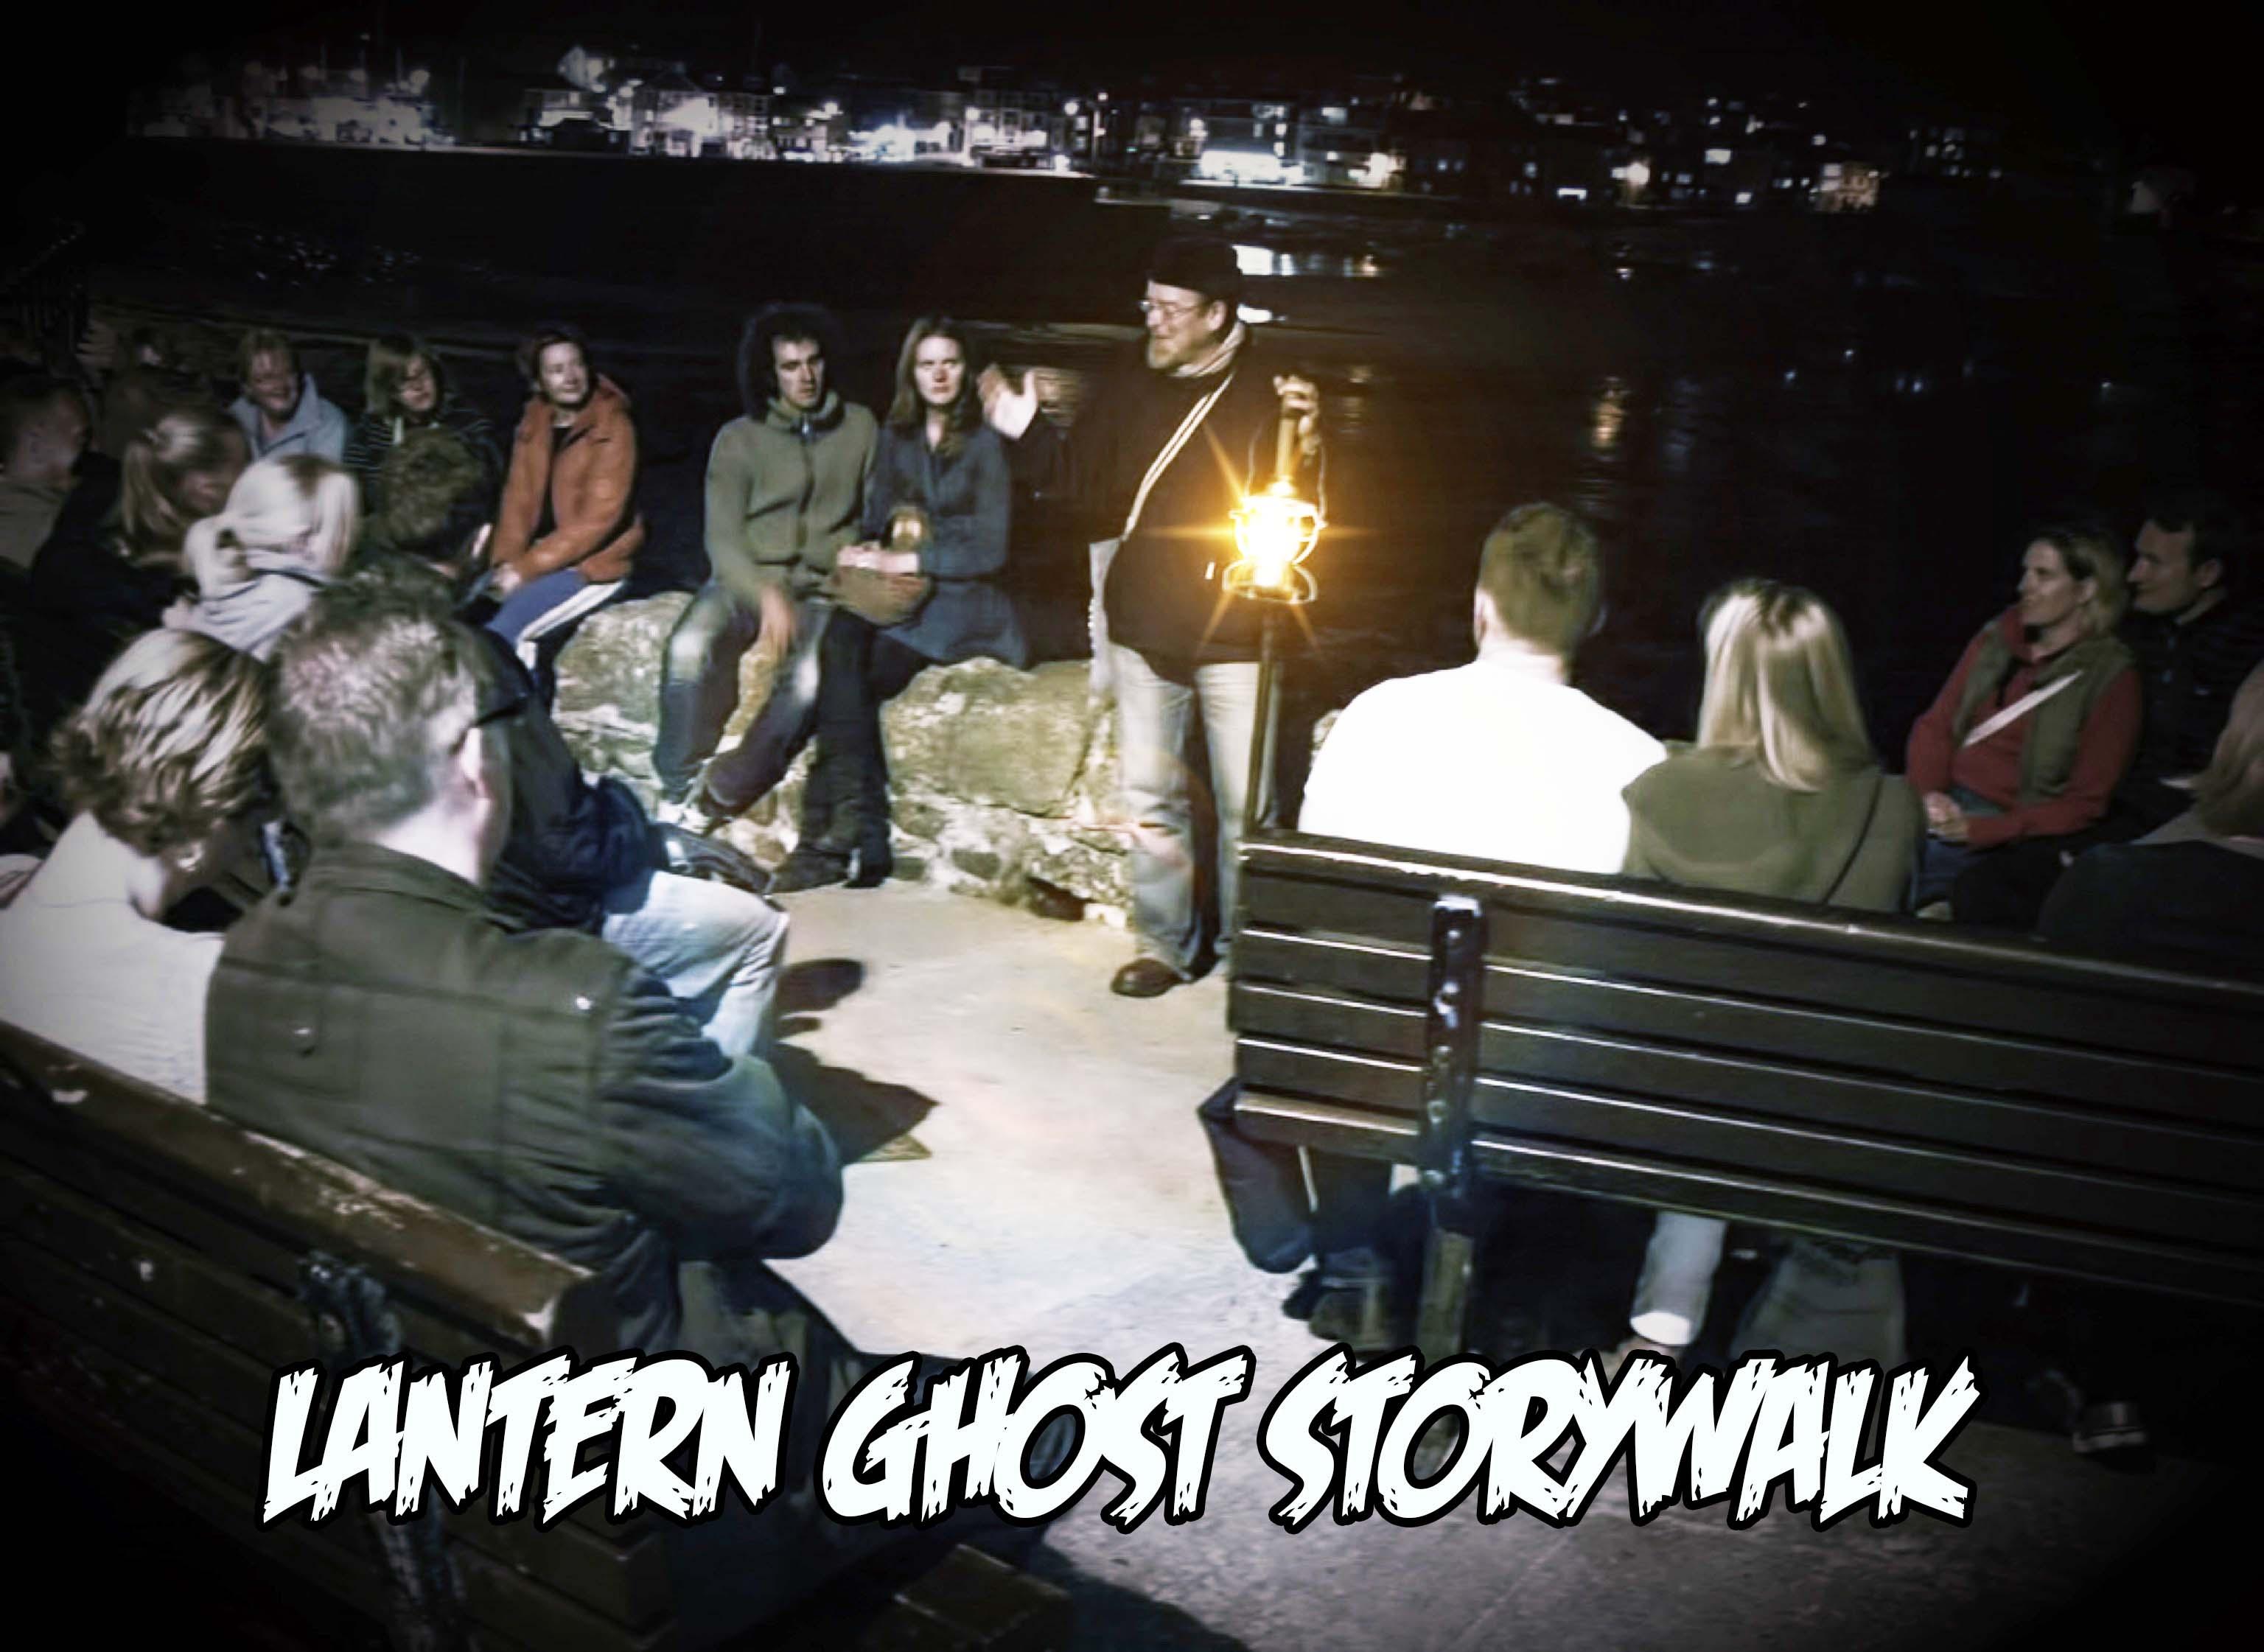 Lantern Ghost Storywalk